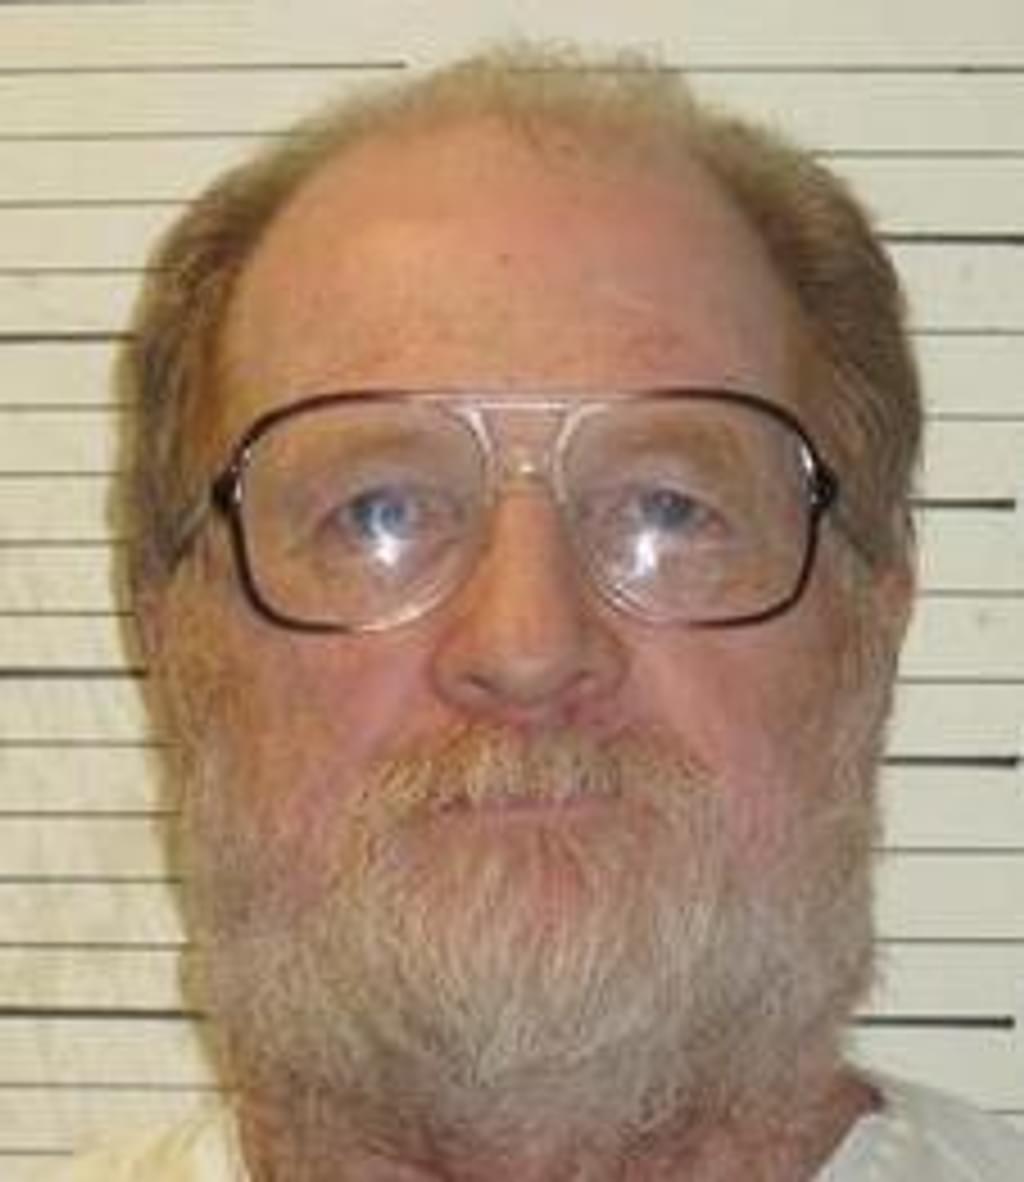 News Brief — Citing Coronavirus, Tennessee Governor Grants Temporary Reprieve to Harold Nichols